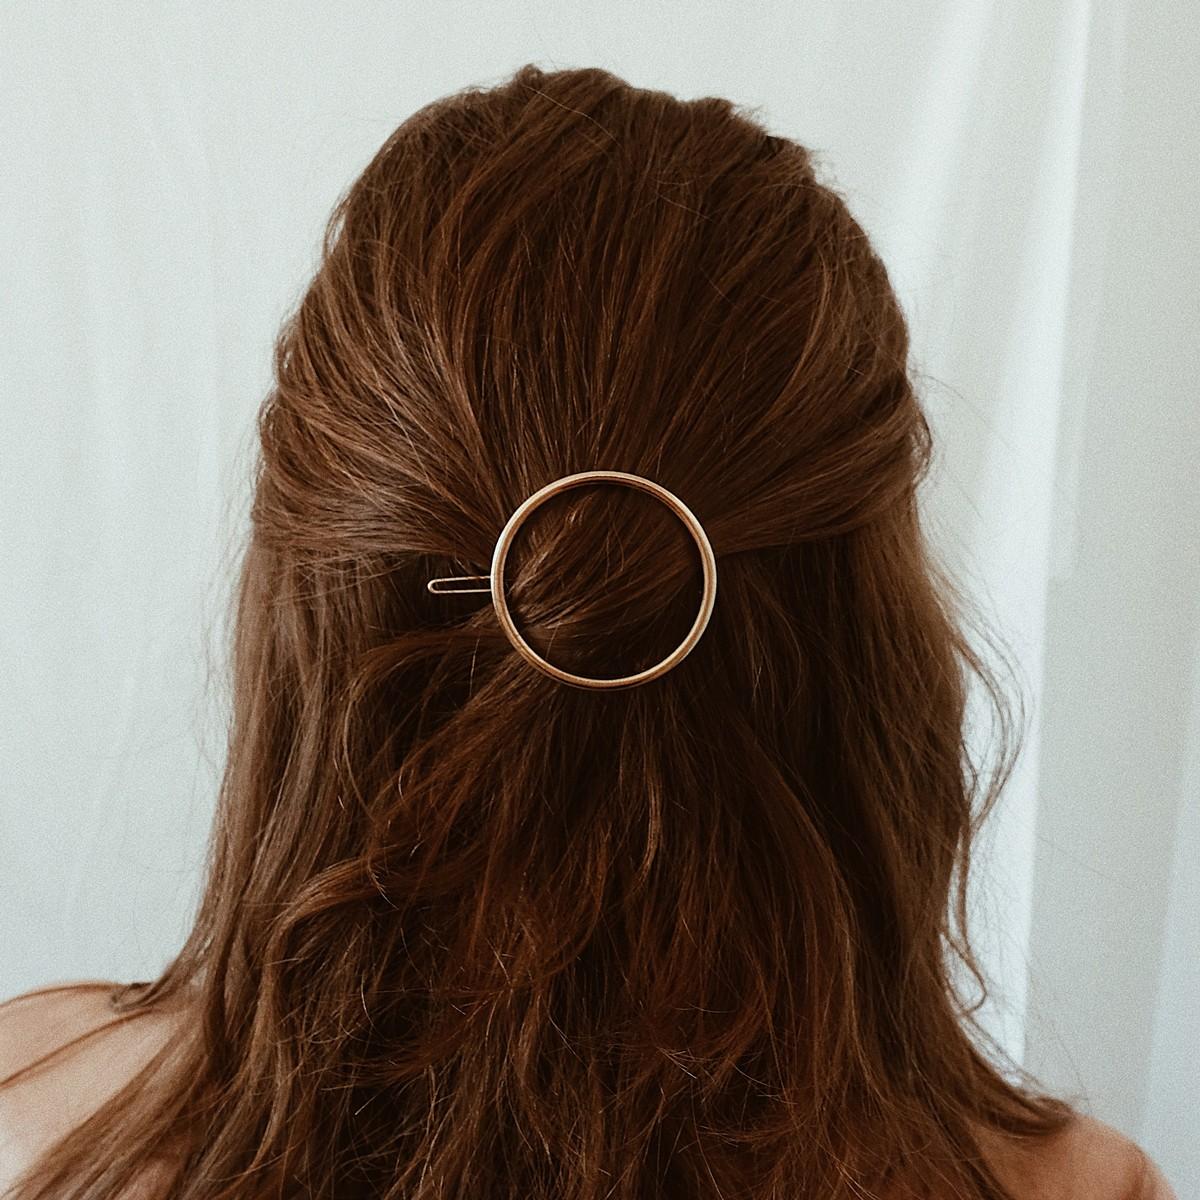 ST'ATOUR MAGNA NAKED – runde Haarspange in Gold, Silber oder Roségold